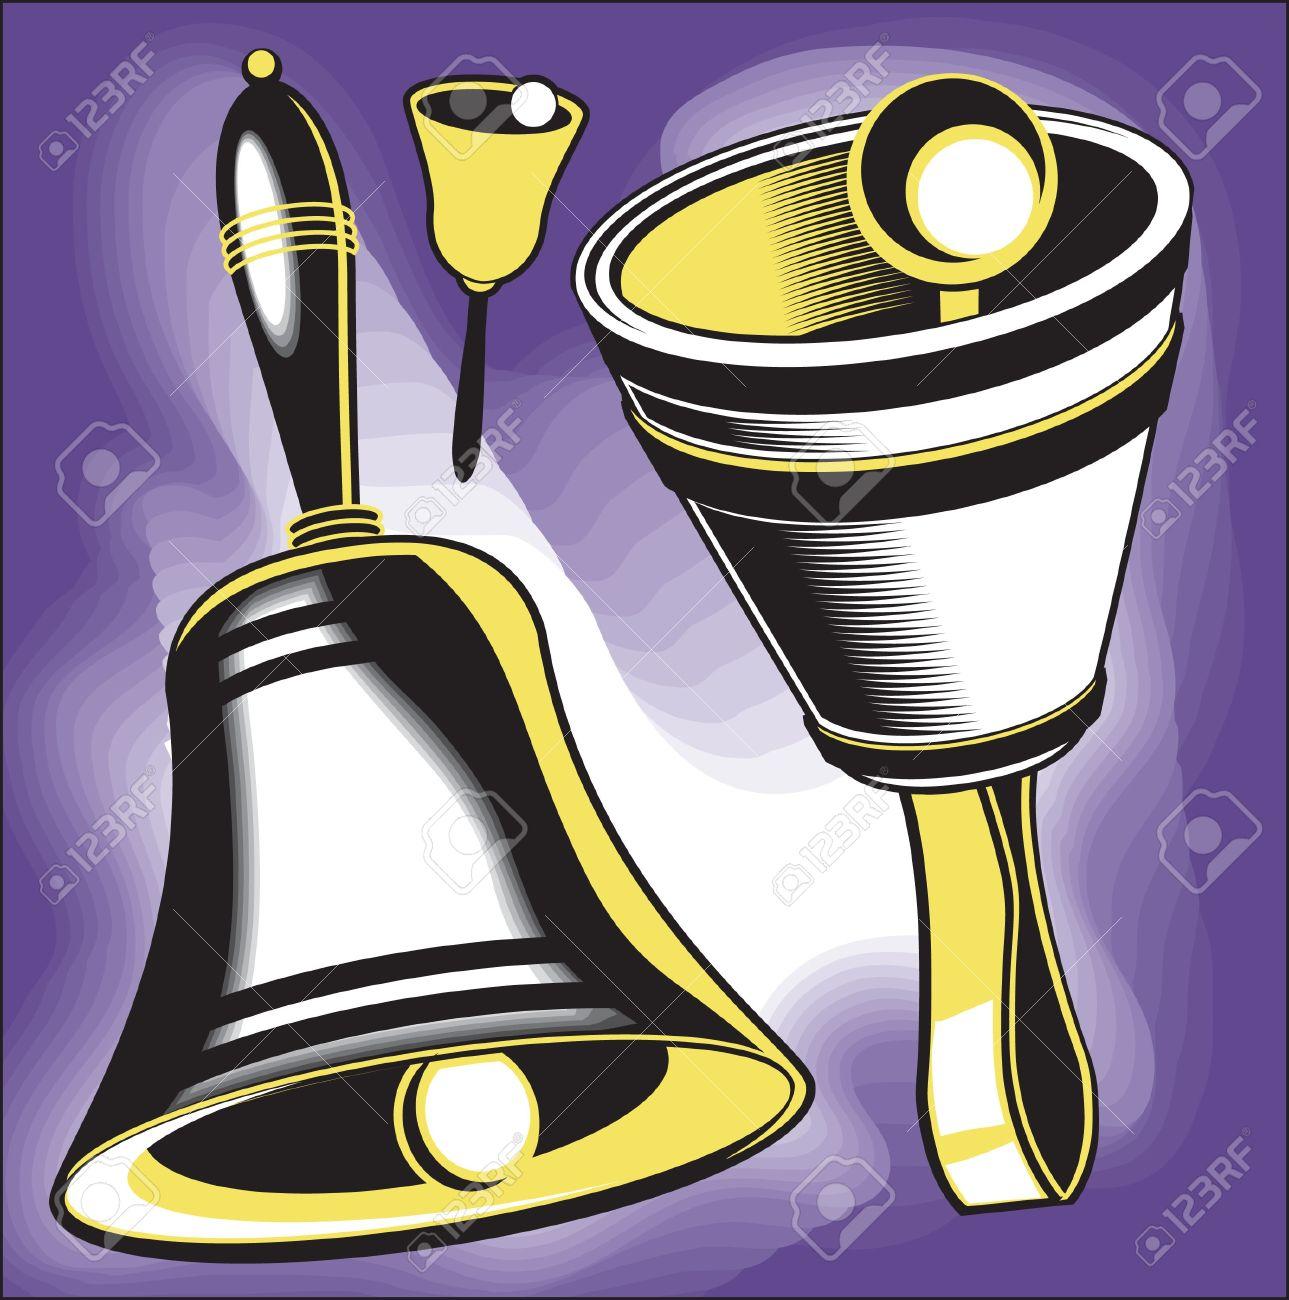 Clip art set of hand bell instruments Stock Vector - 10444270